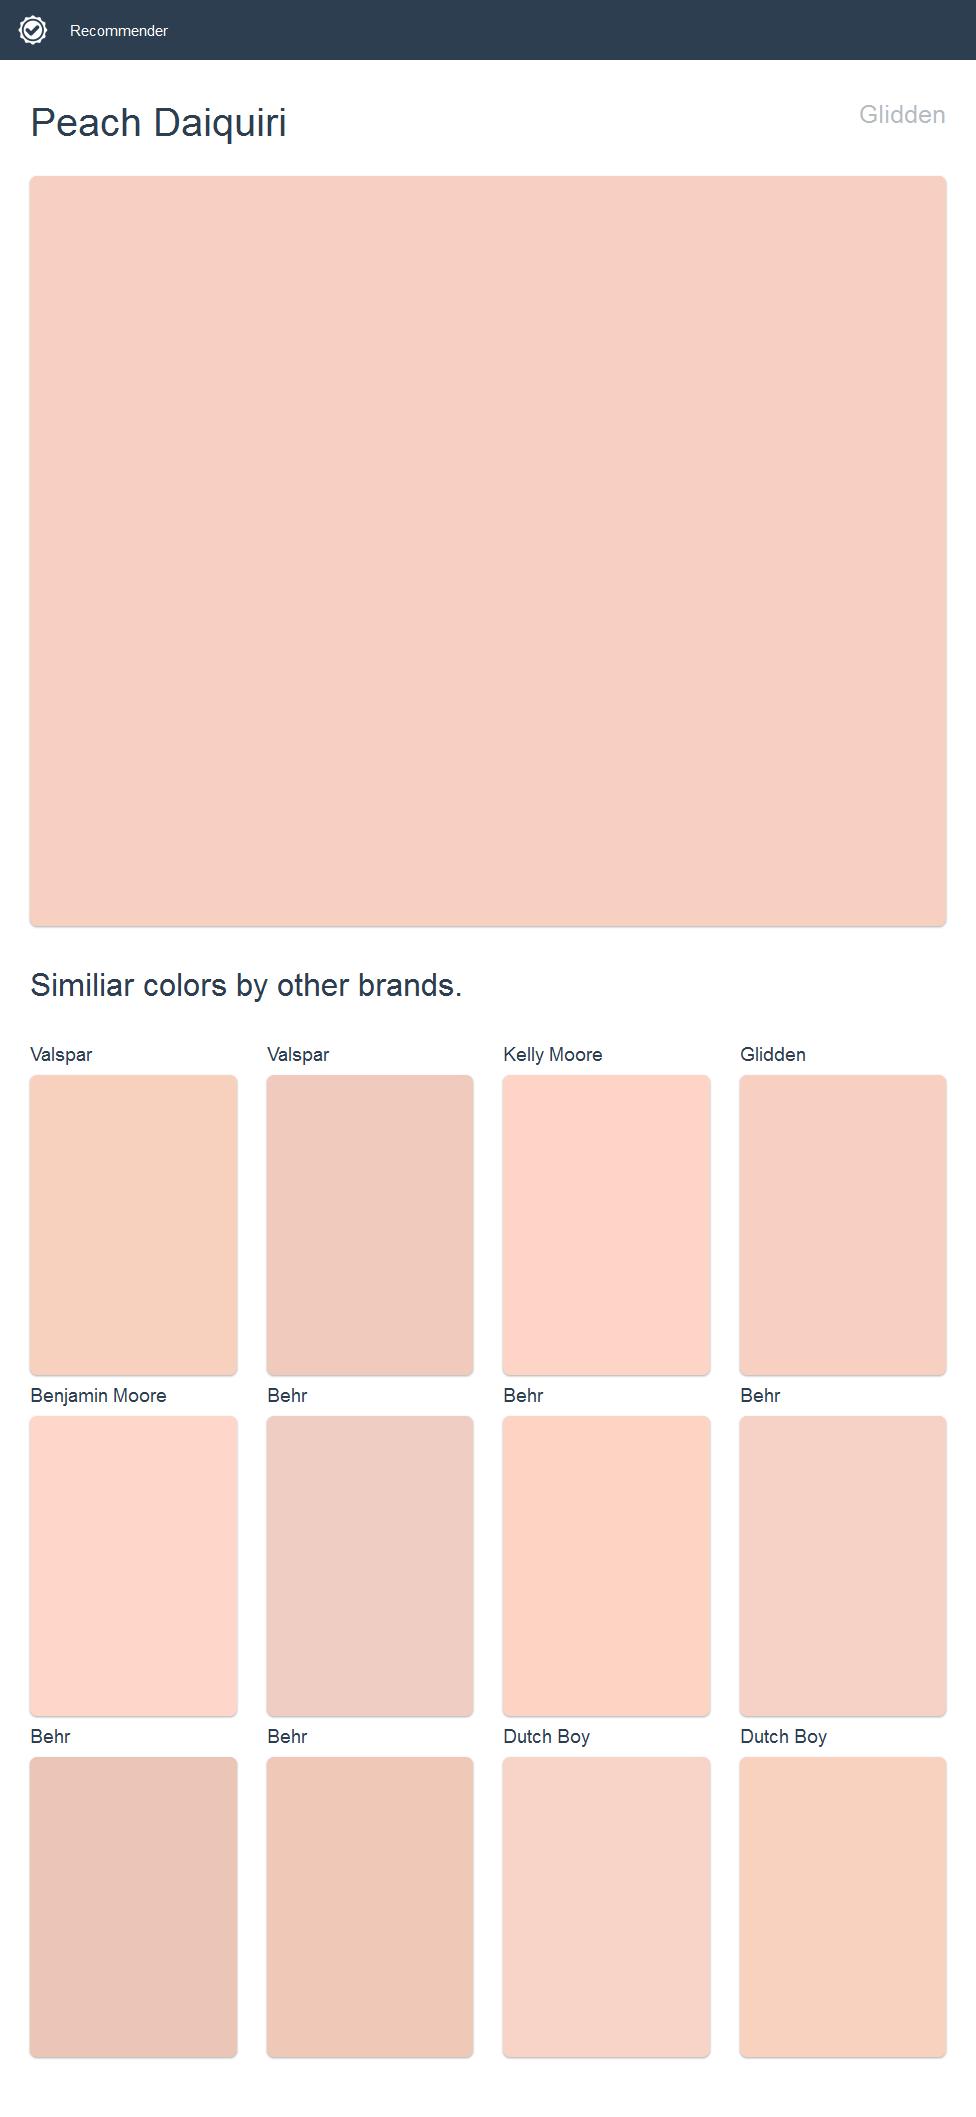 Peach Daiquiri, Glidden Click The Image To See Similiar Colors